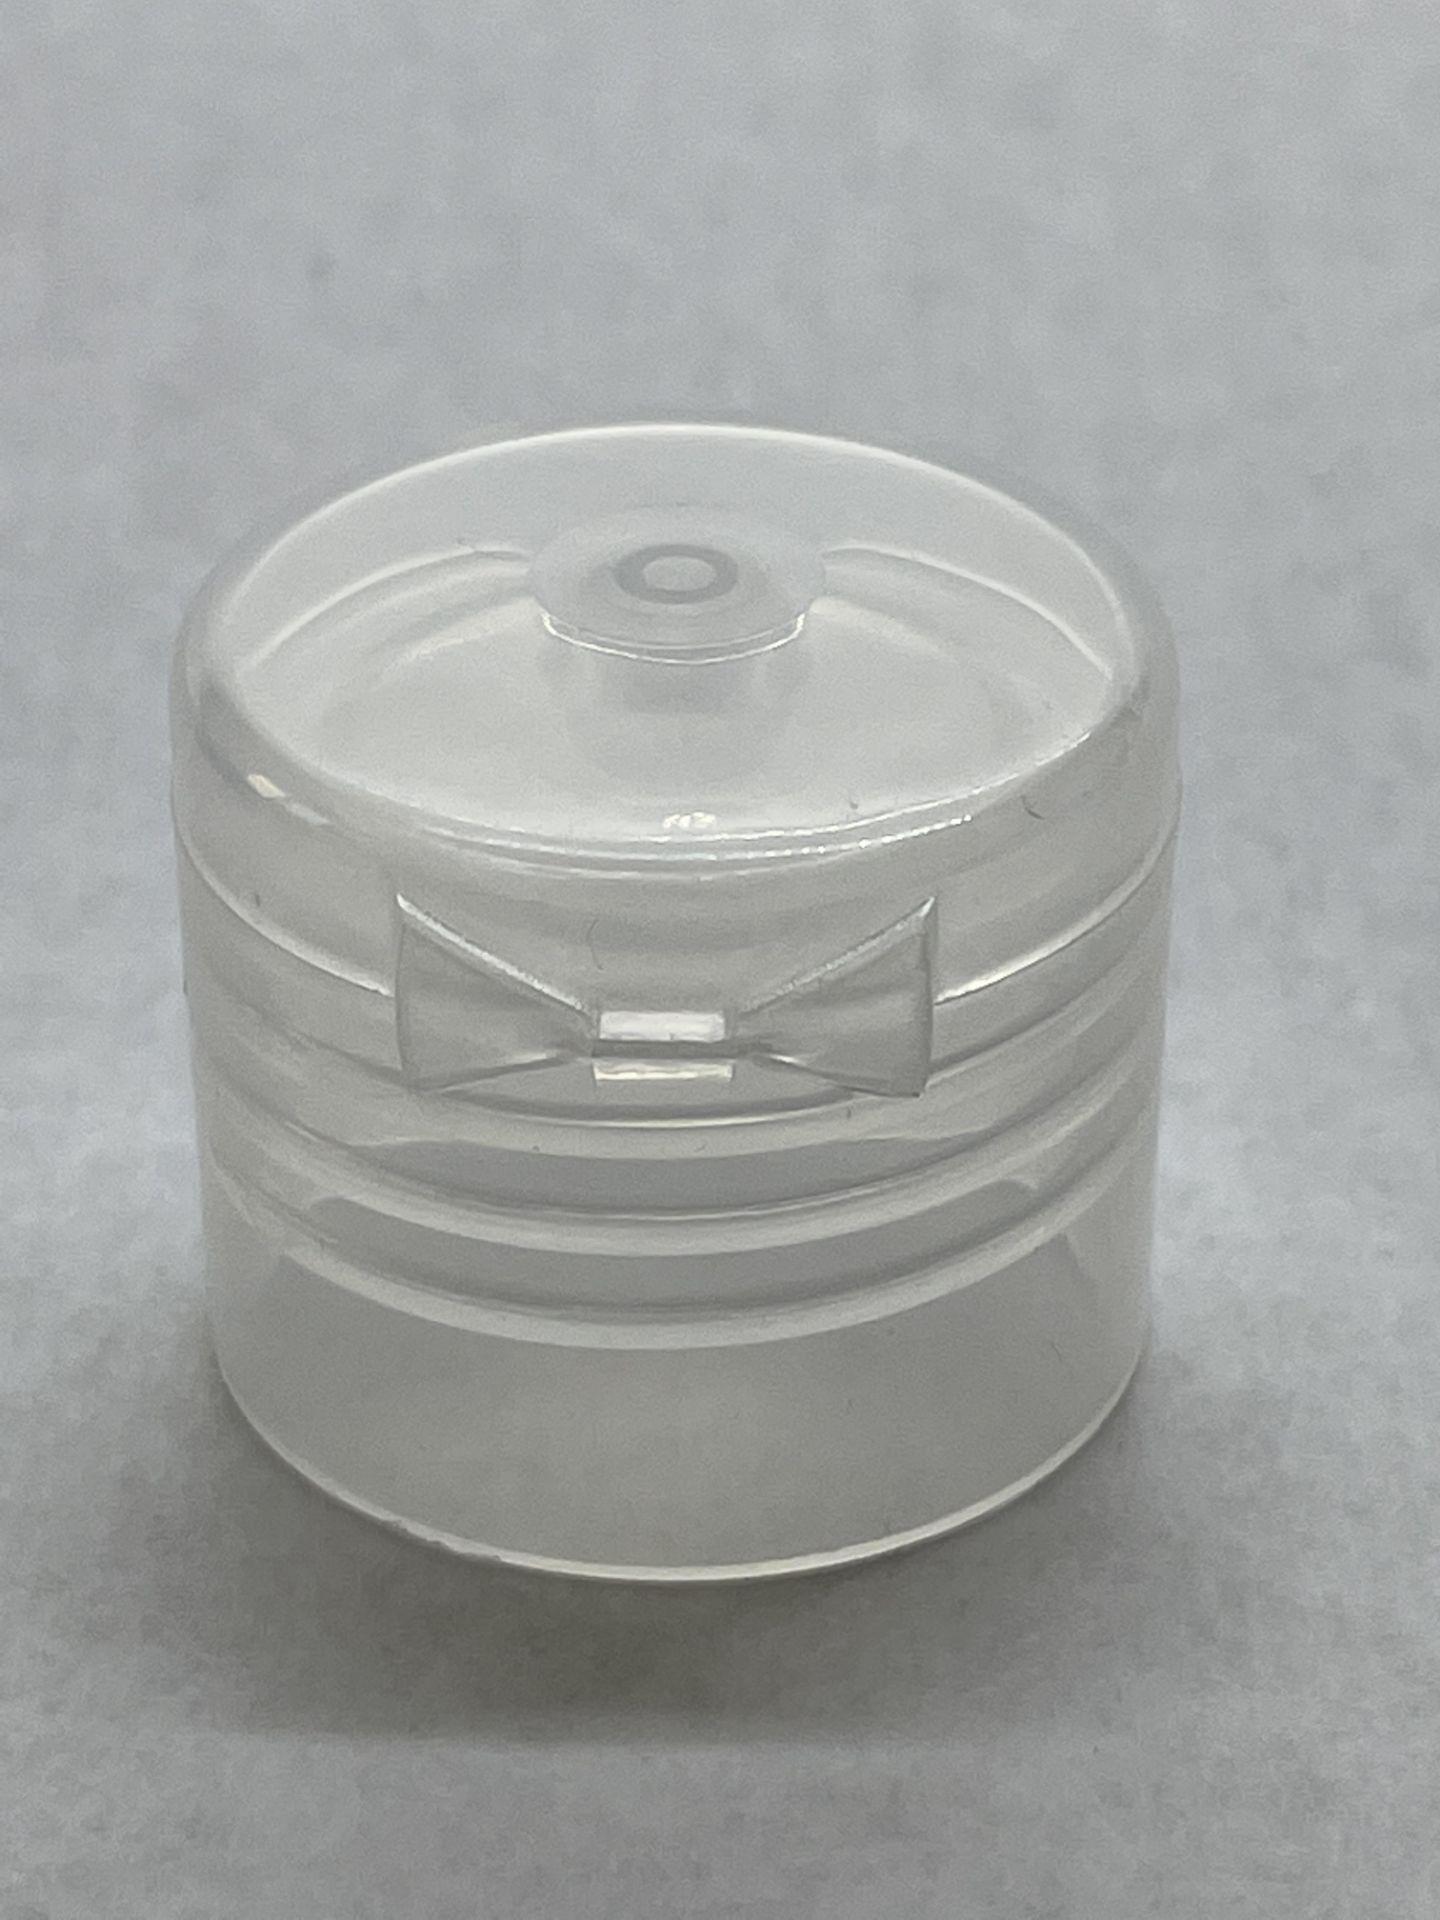 128,000 - Clear Flip Bottle Caps for 4oz and 8oz bottle, 24-410 - Image 3 of 4